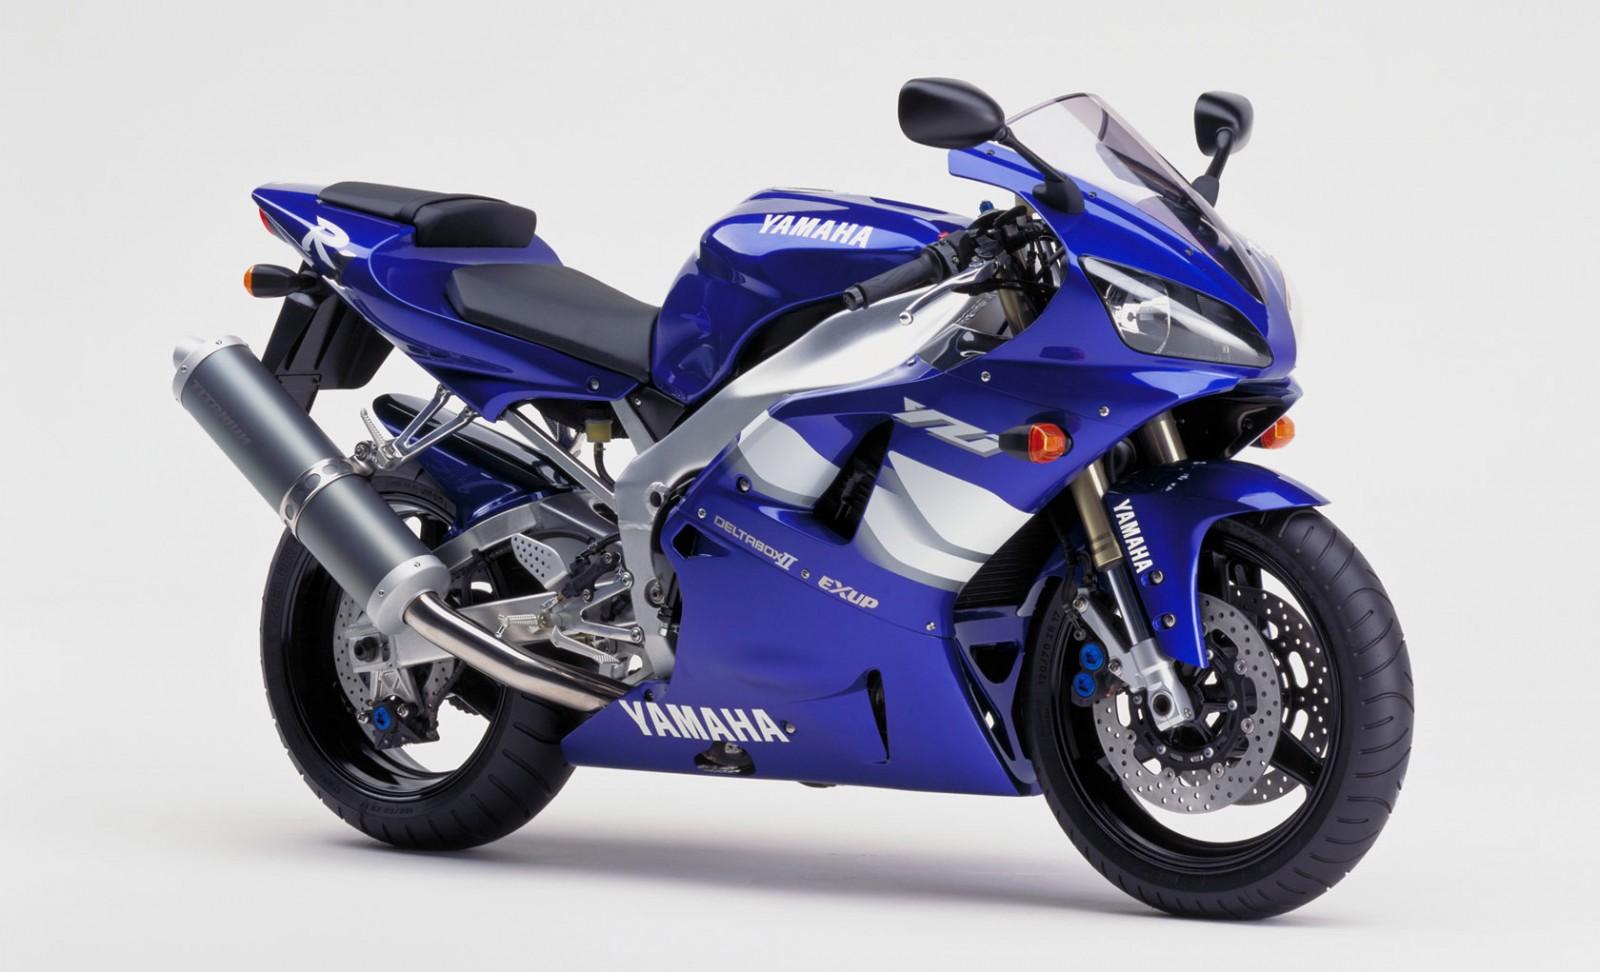 Hjc Fg 17 >> Yamaha YZF-R1 1000 RN04 (2000 - 2001) vs Kawasaki ZX-10R 1000 Ninja (2004 - 2005)